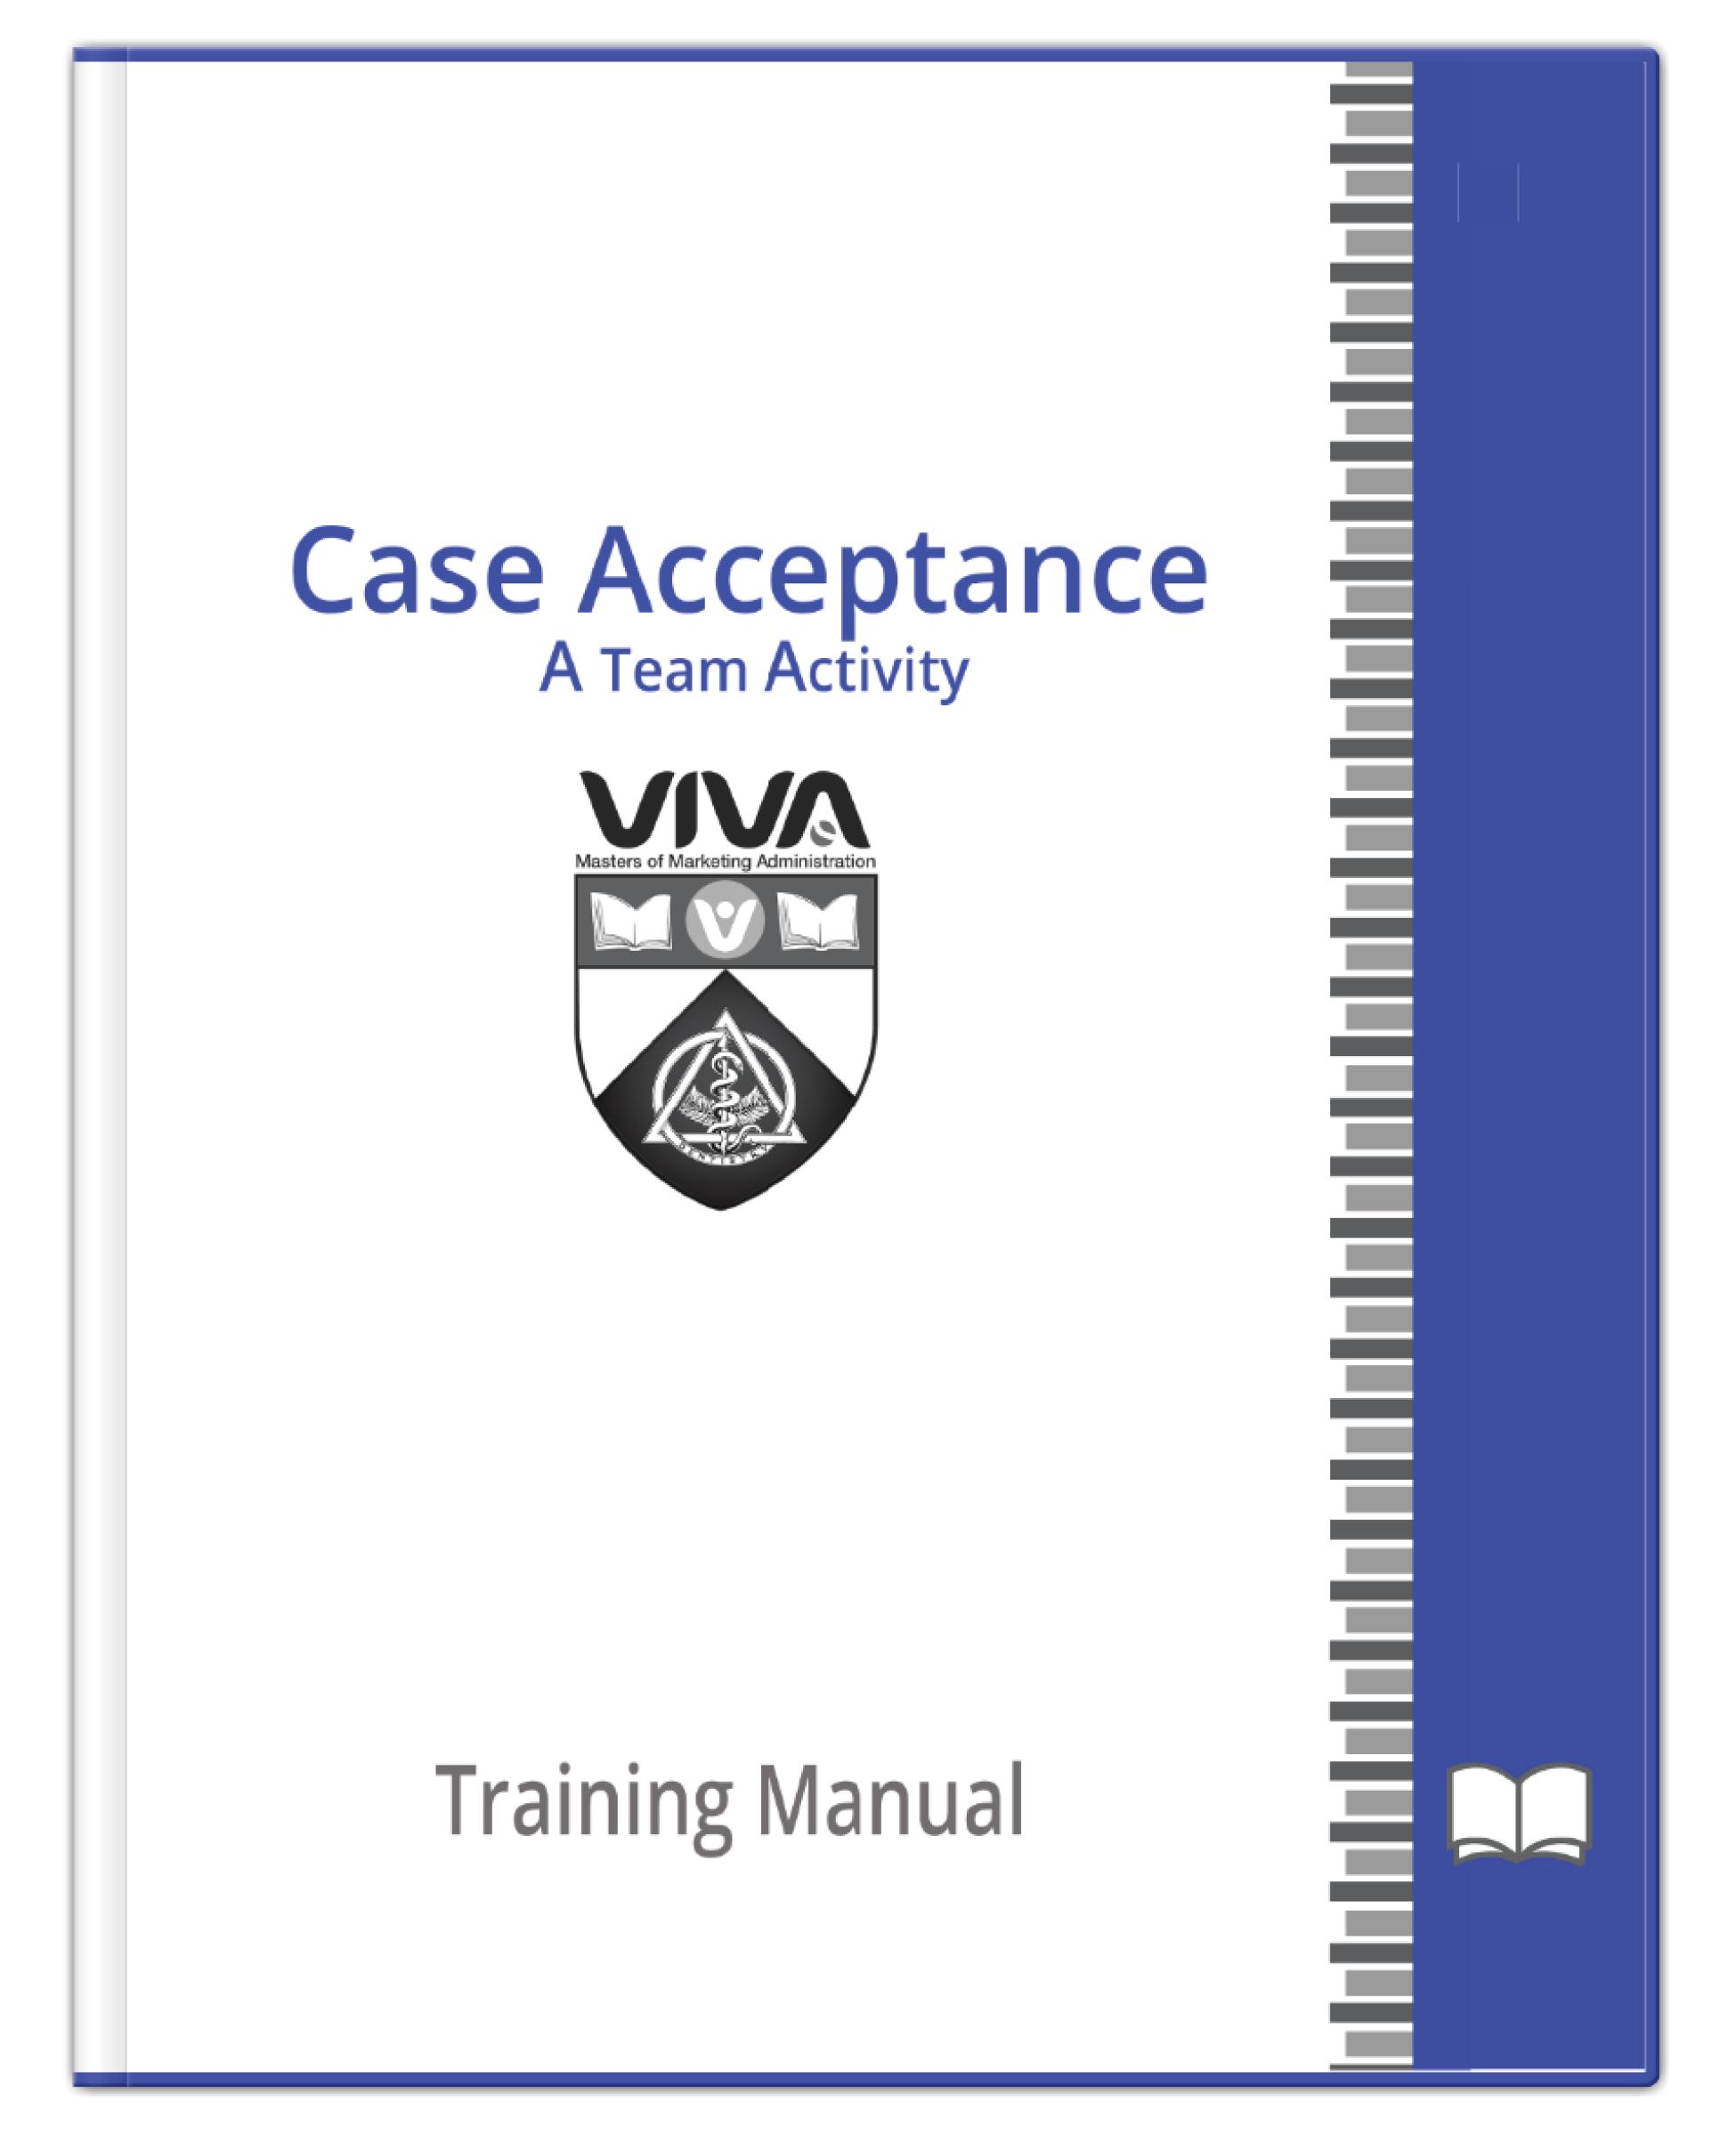 Case Acceptance Cover.png